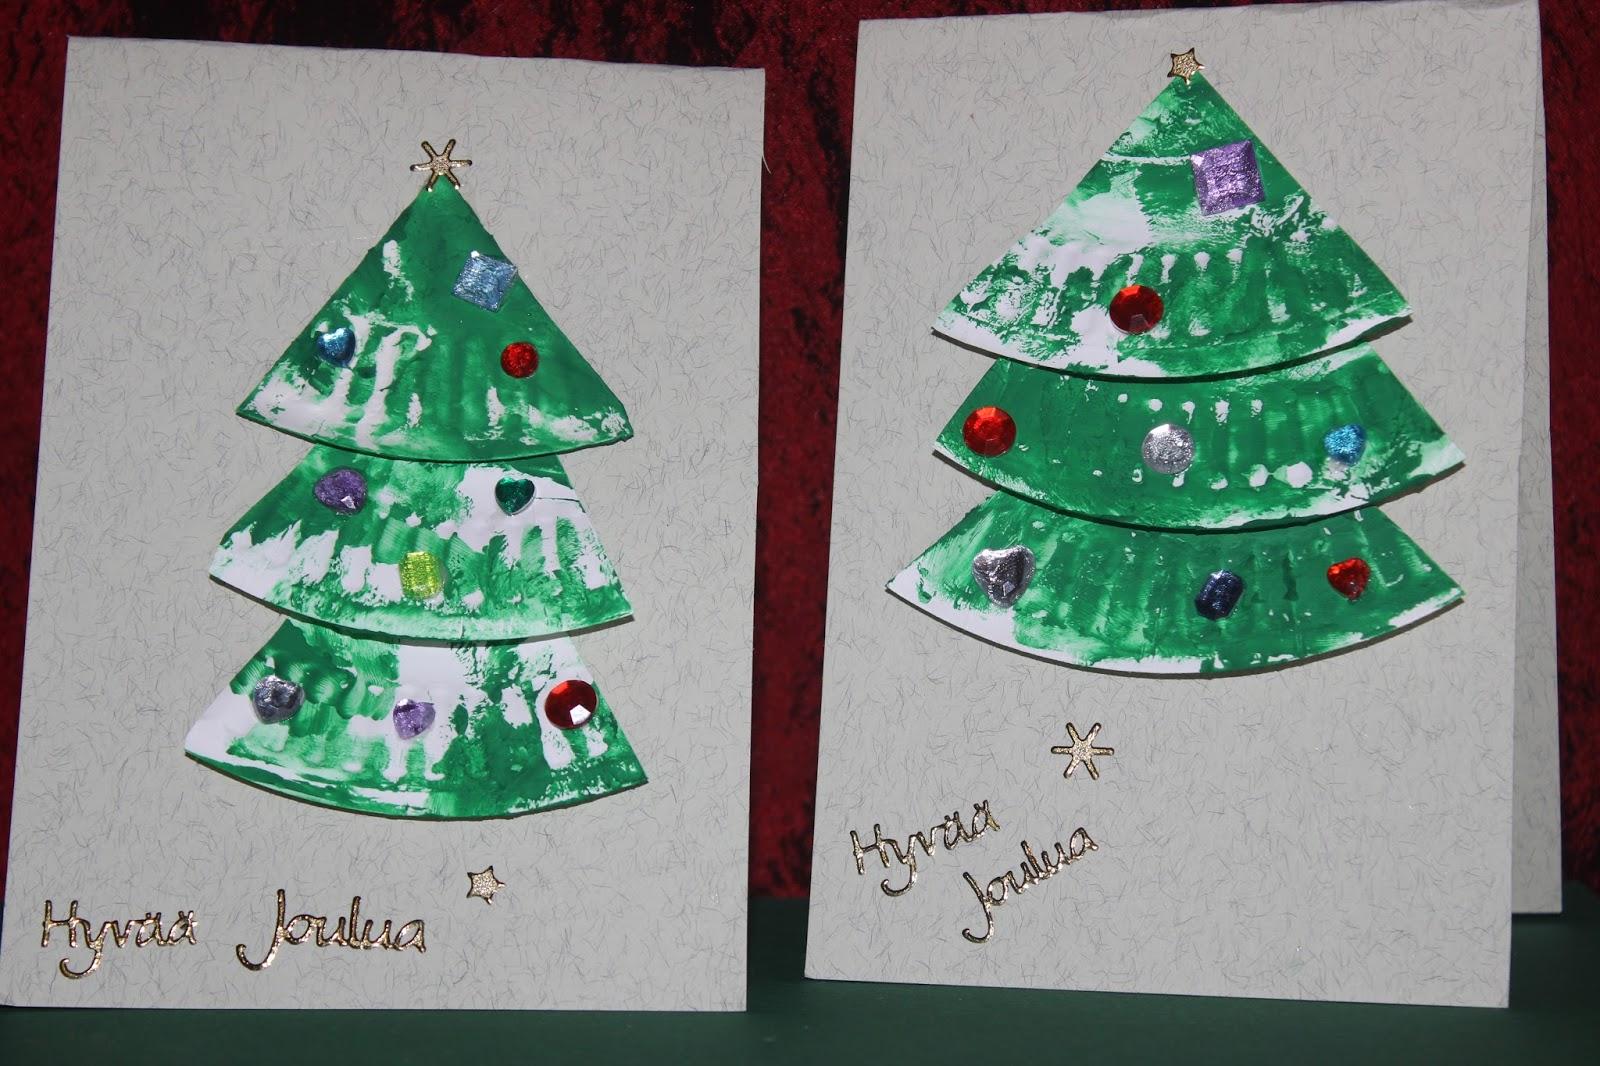 joulukortti askartelu Nappikuja 6: Luukku 4 : Joulukorttien askartelua joulukortti askartelu